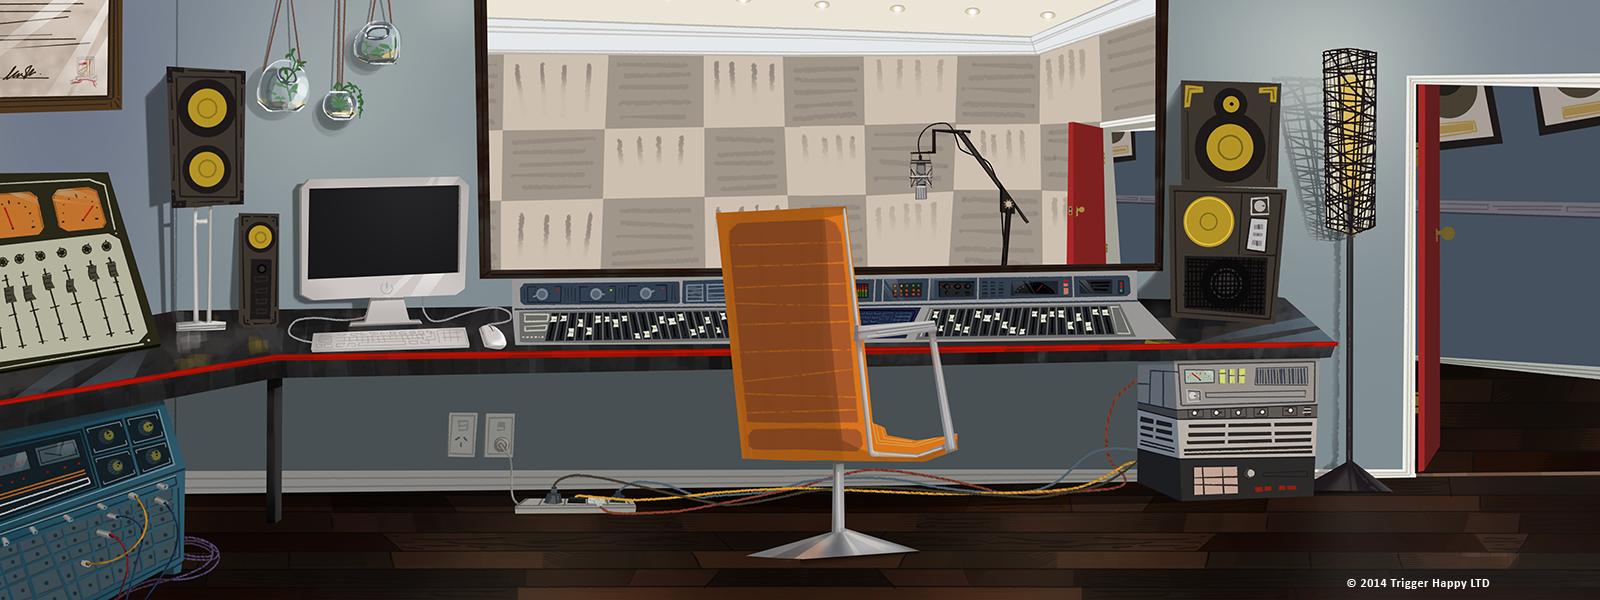 RecordingStudio01+02.png